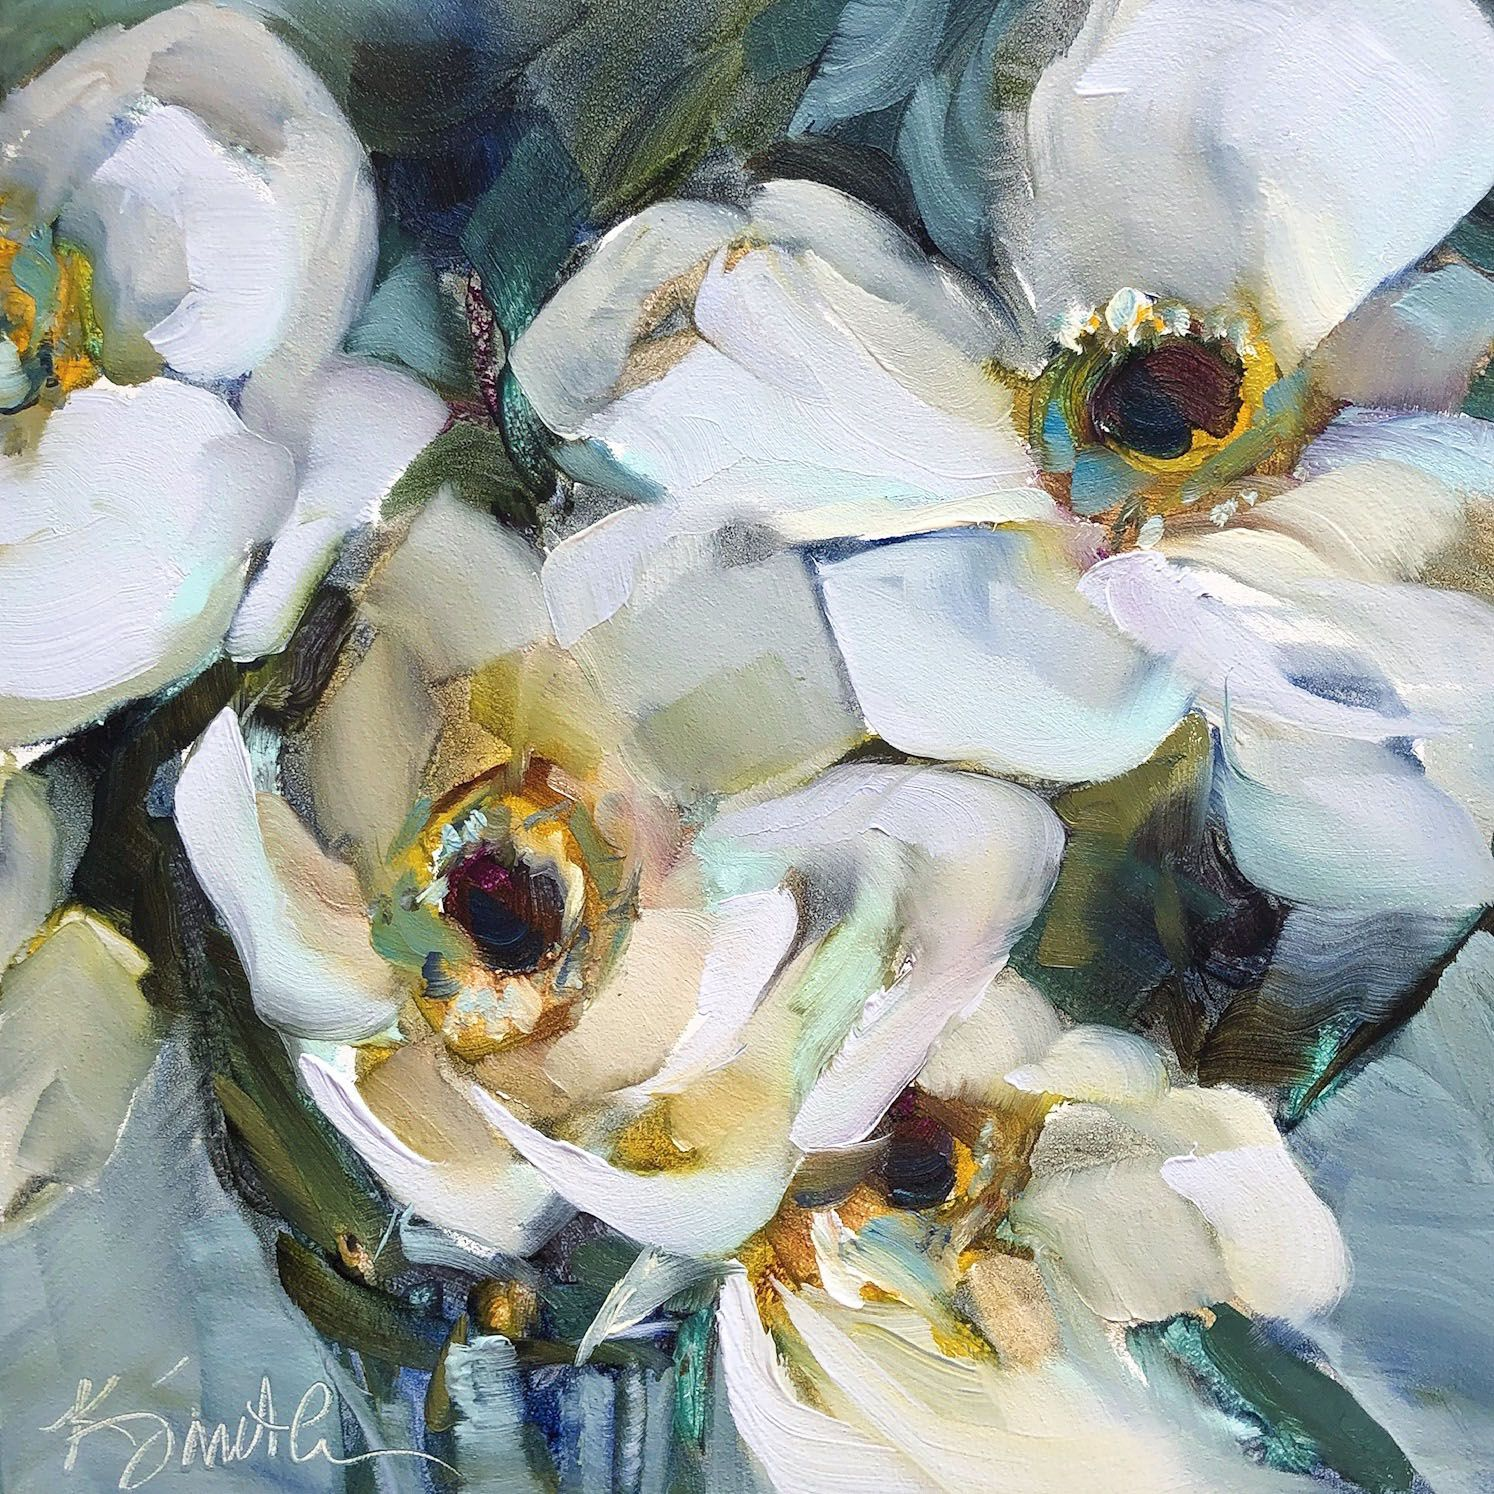 Anemone Original Oil Painting Demo By Lancaster Pa Artist Kim Smith Flores Pintadas Pintar En Tela Pintar